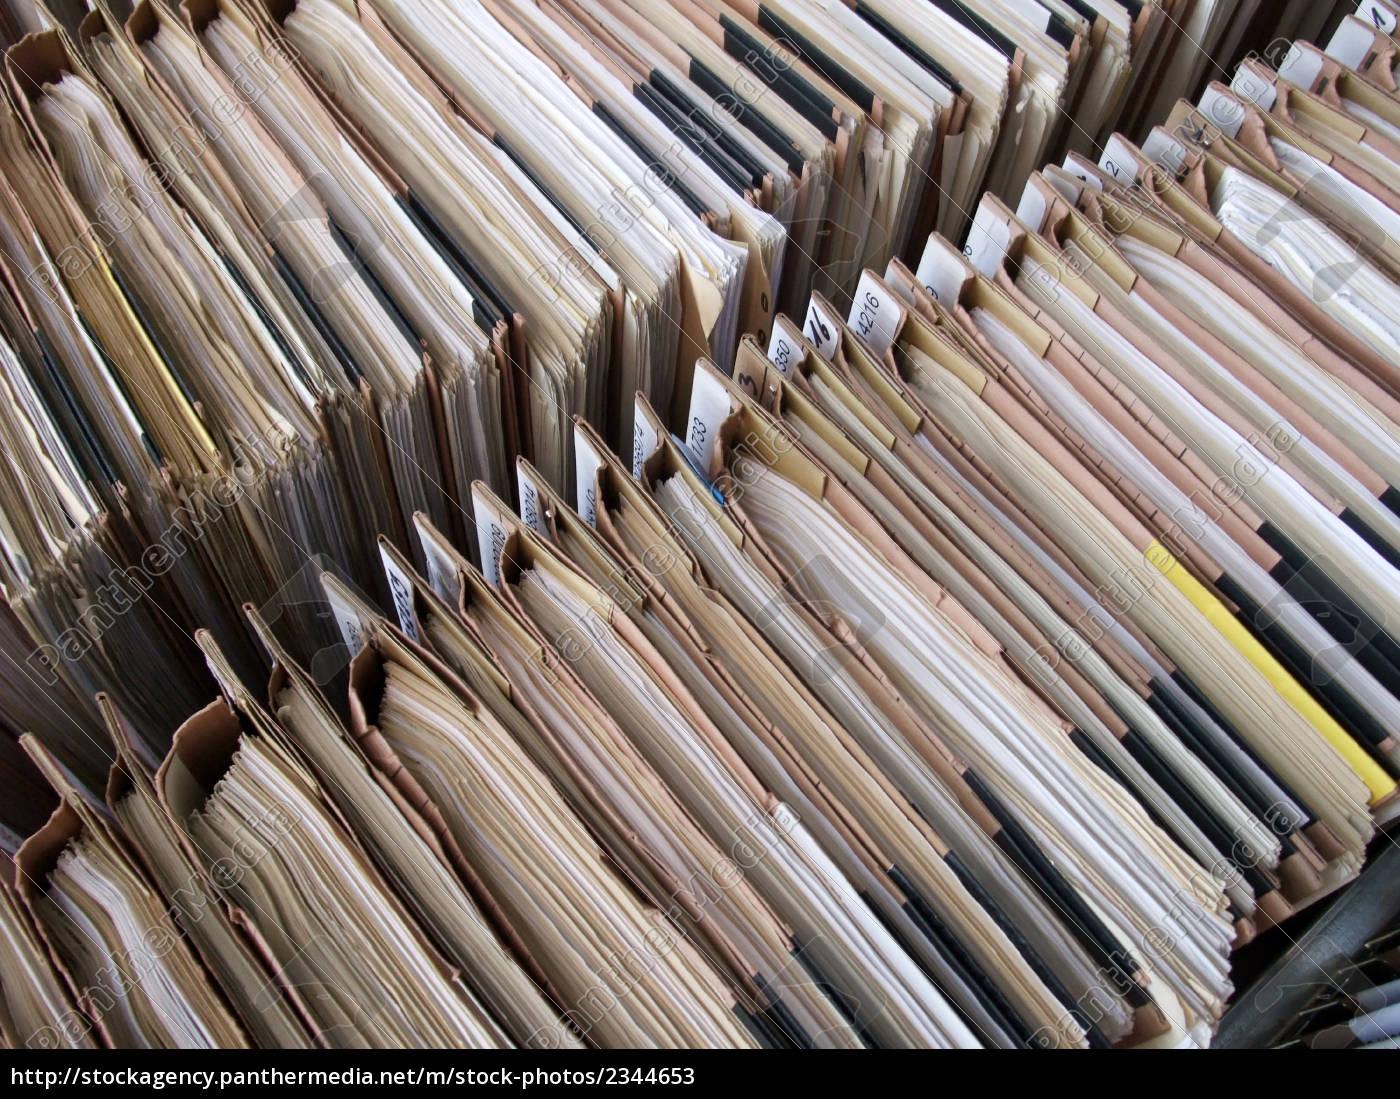 files, on, the, shelf - 2344653